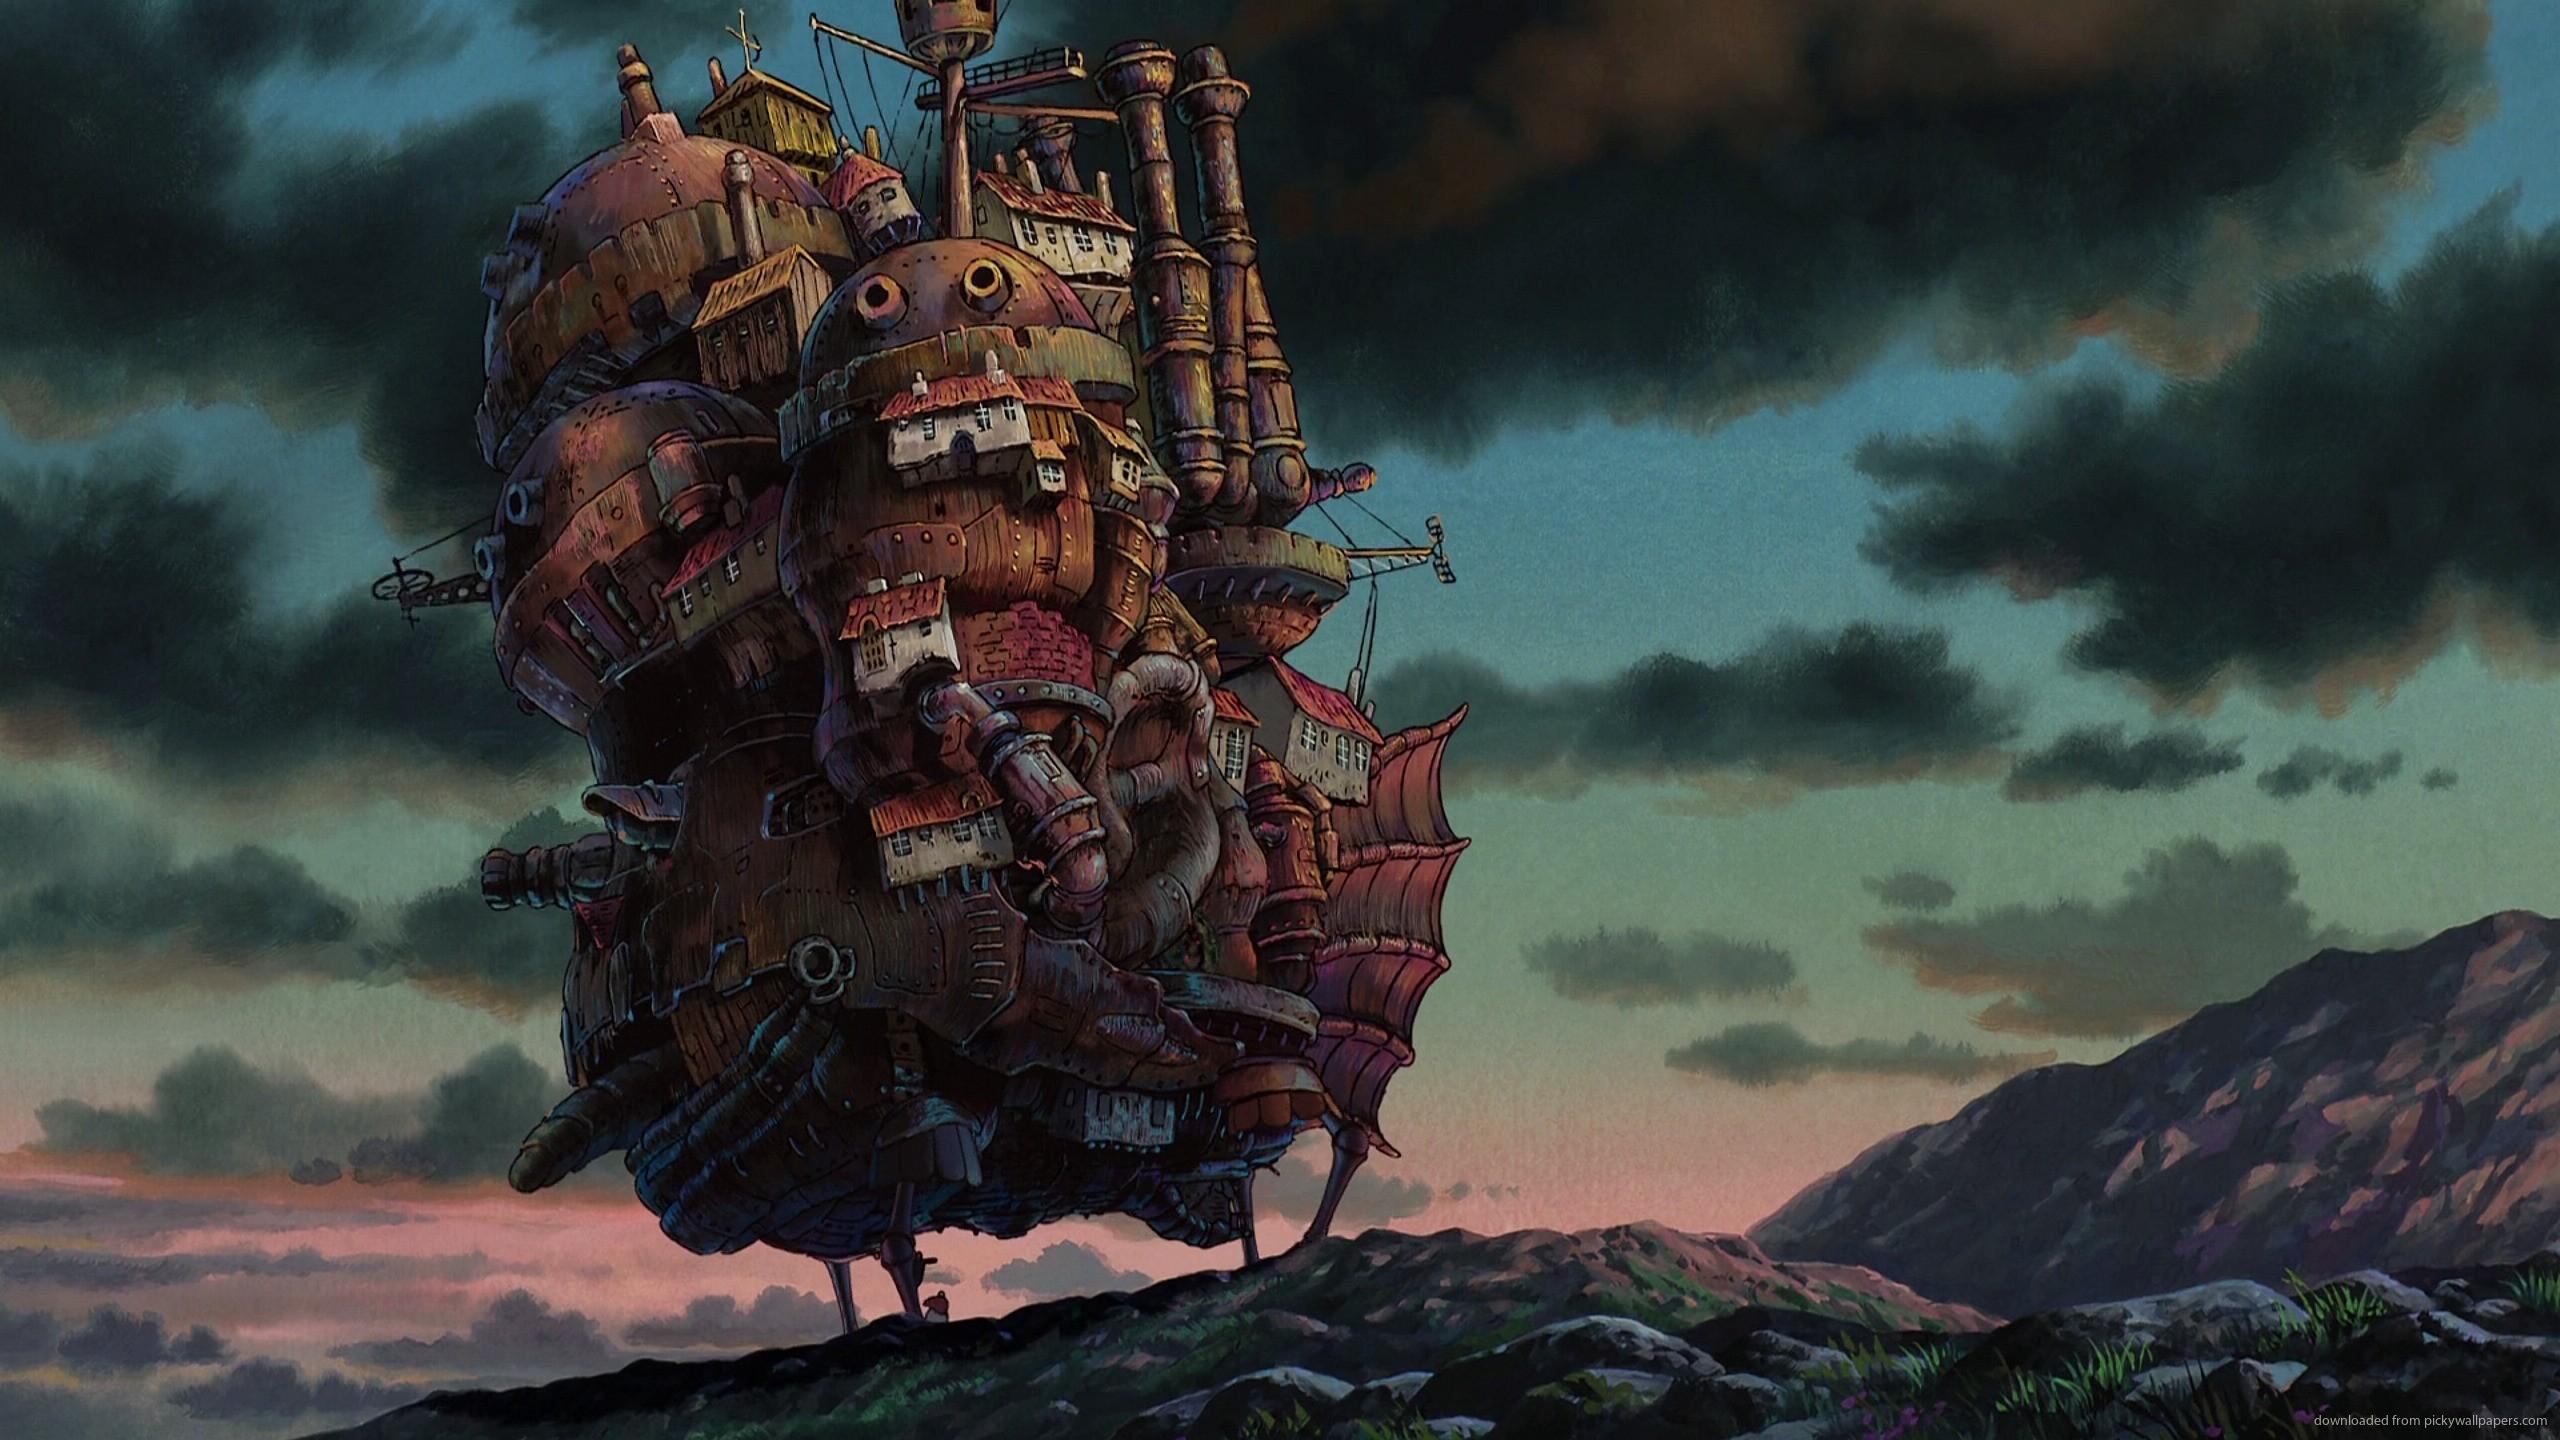 Fantasy Pirate Ship Wallpaper for 2560×1440